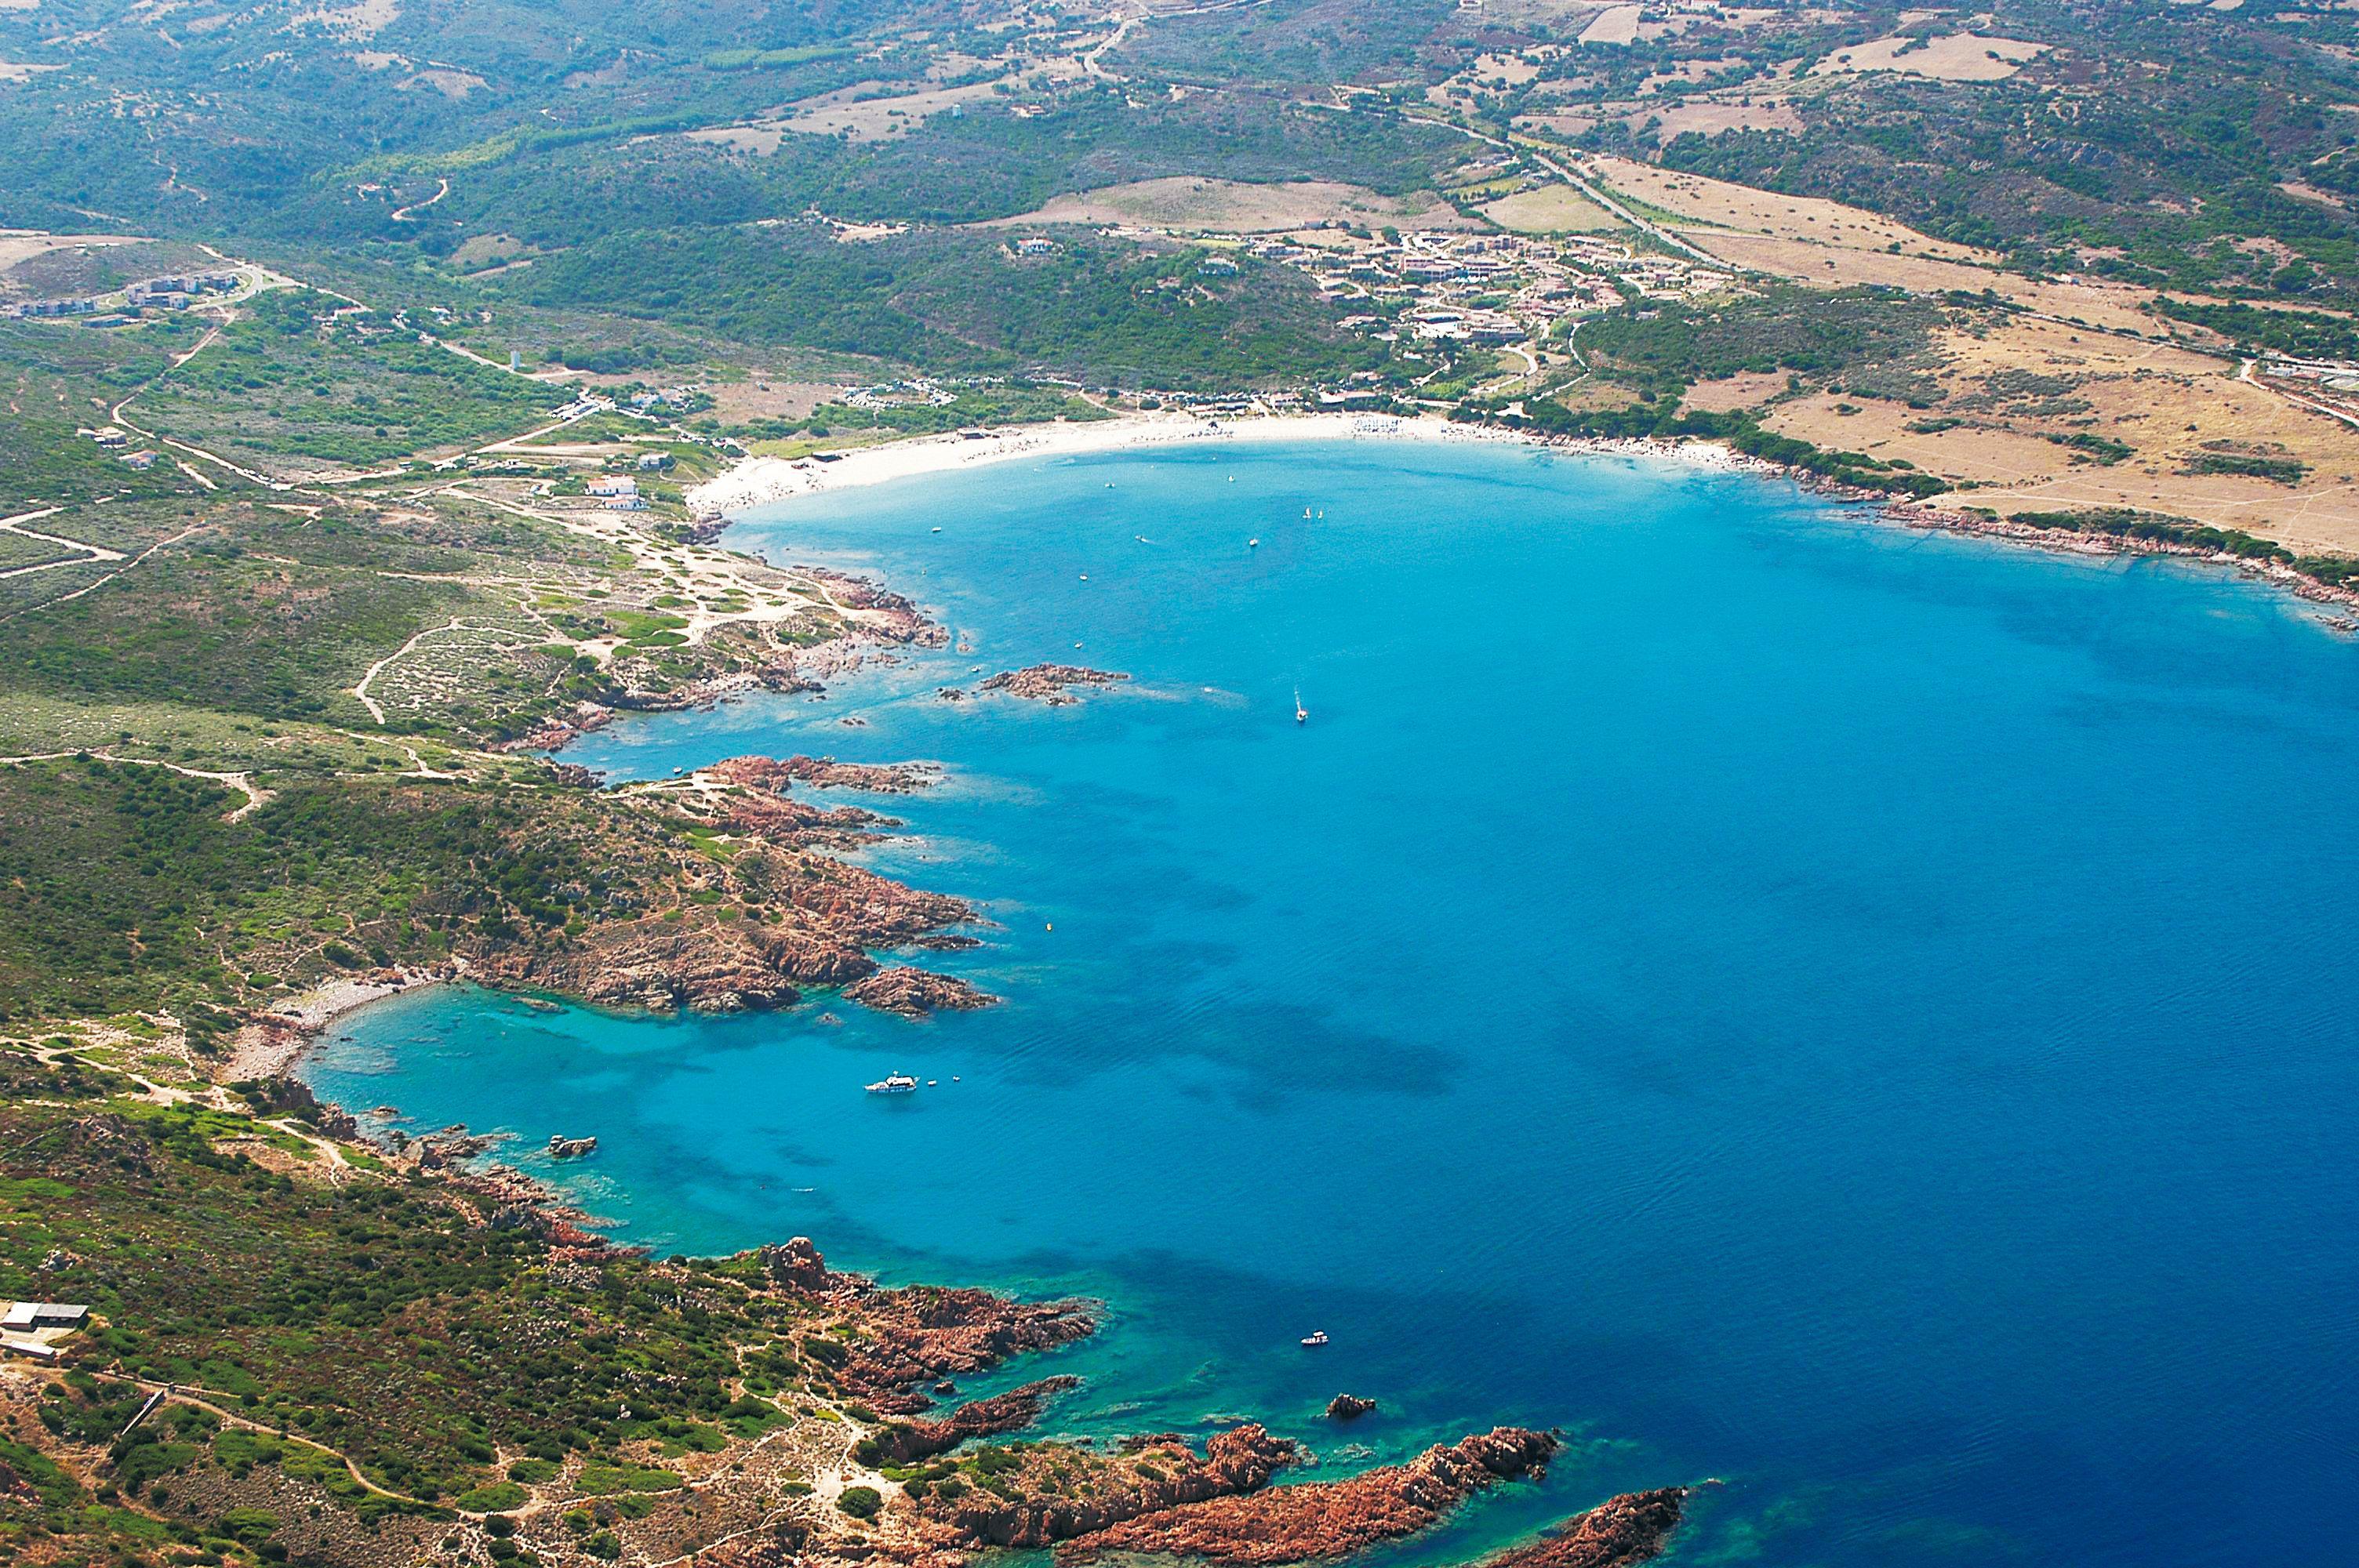 Isola Rossa on the Island of Sardinia